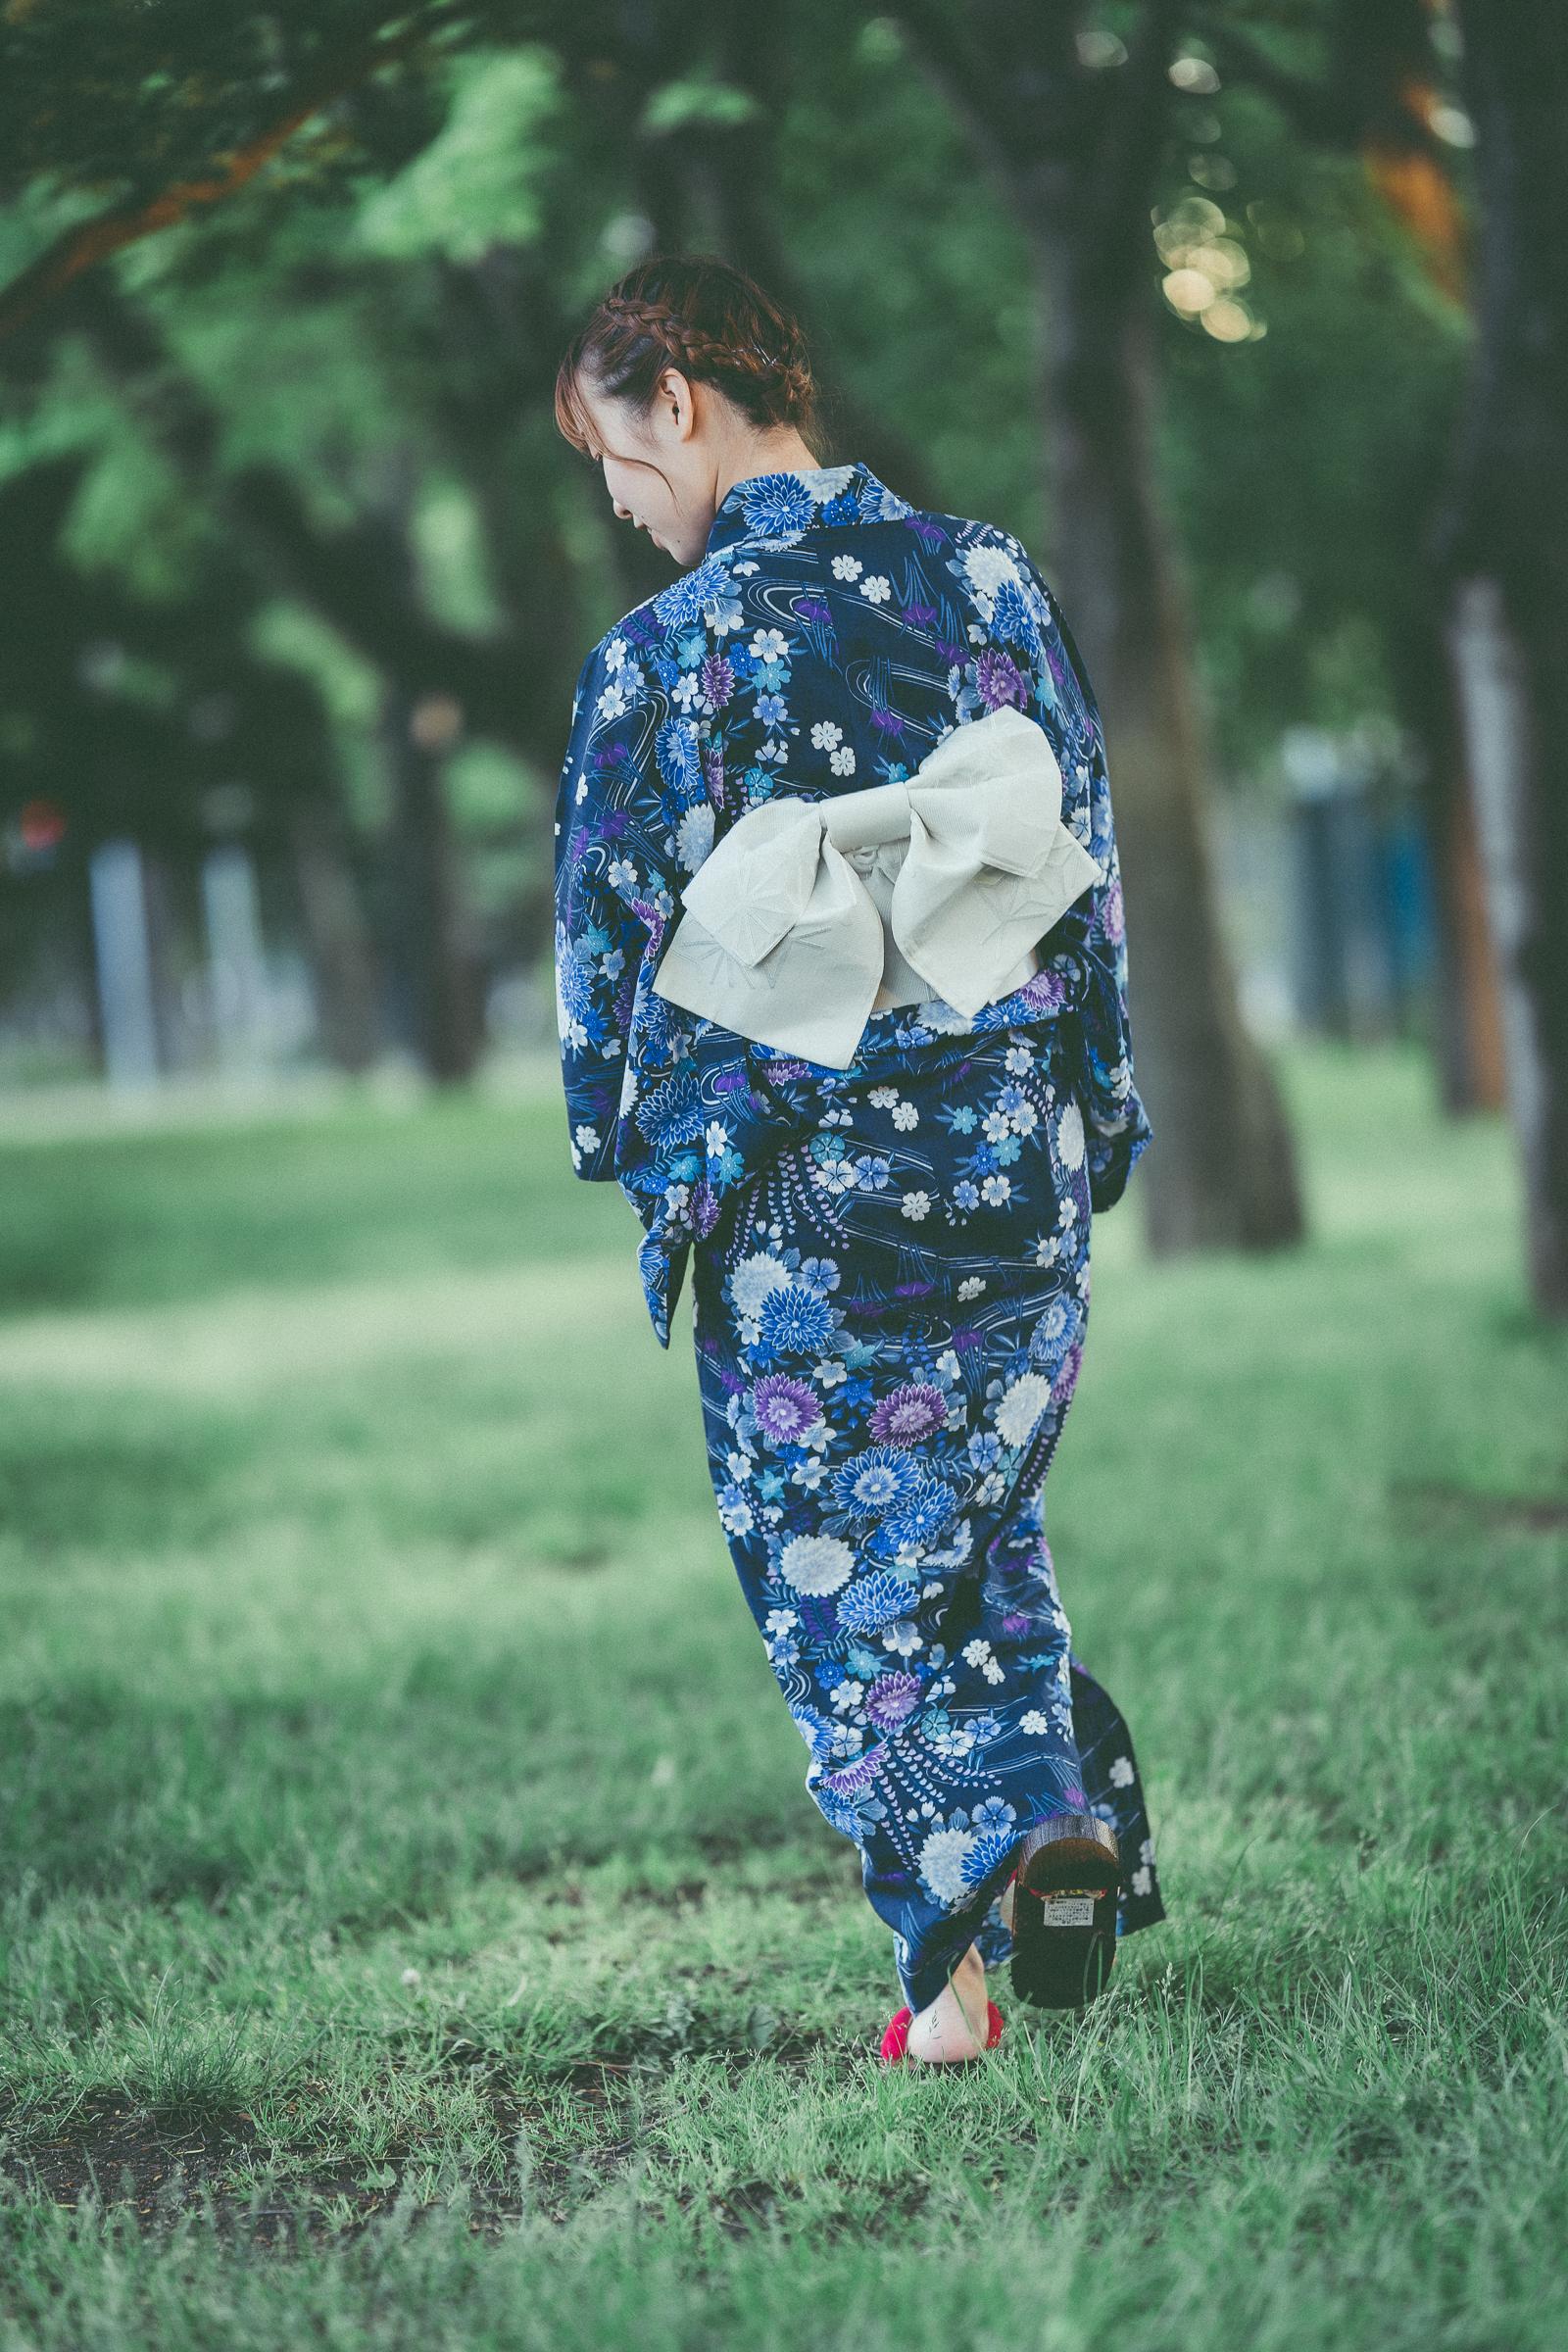 HAPPY少女♪ やよたん ( 藤本やよい ) | SMP 札幌モデルプロ 浴衣撮影会